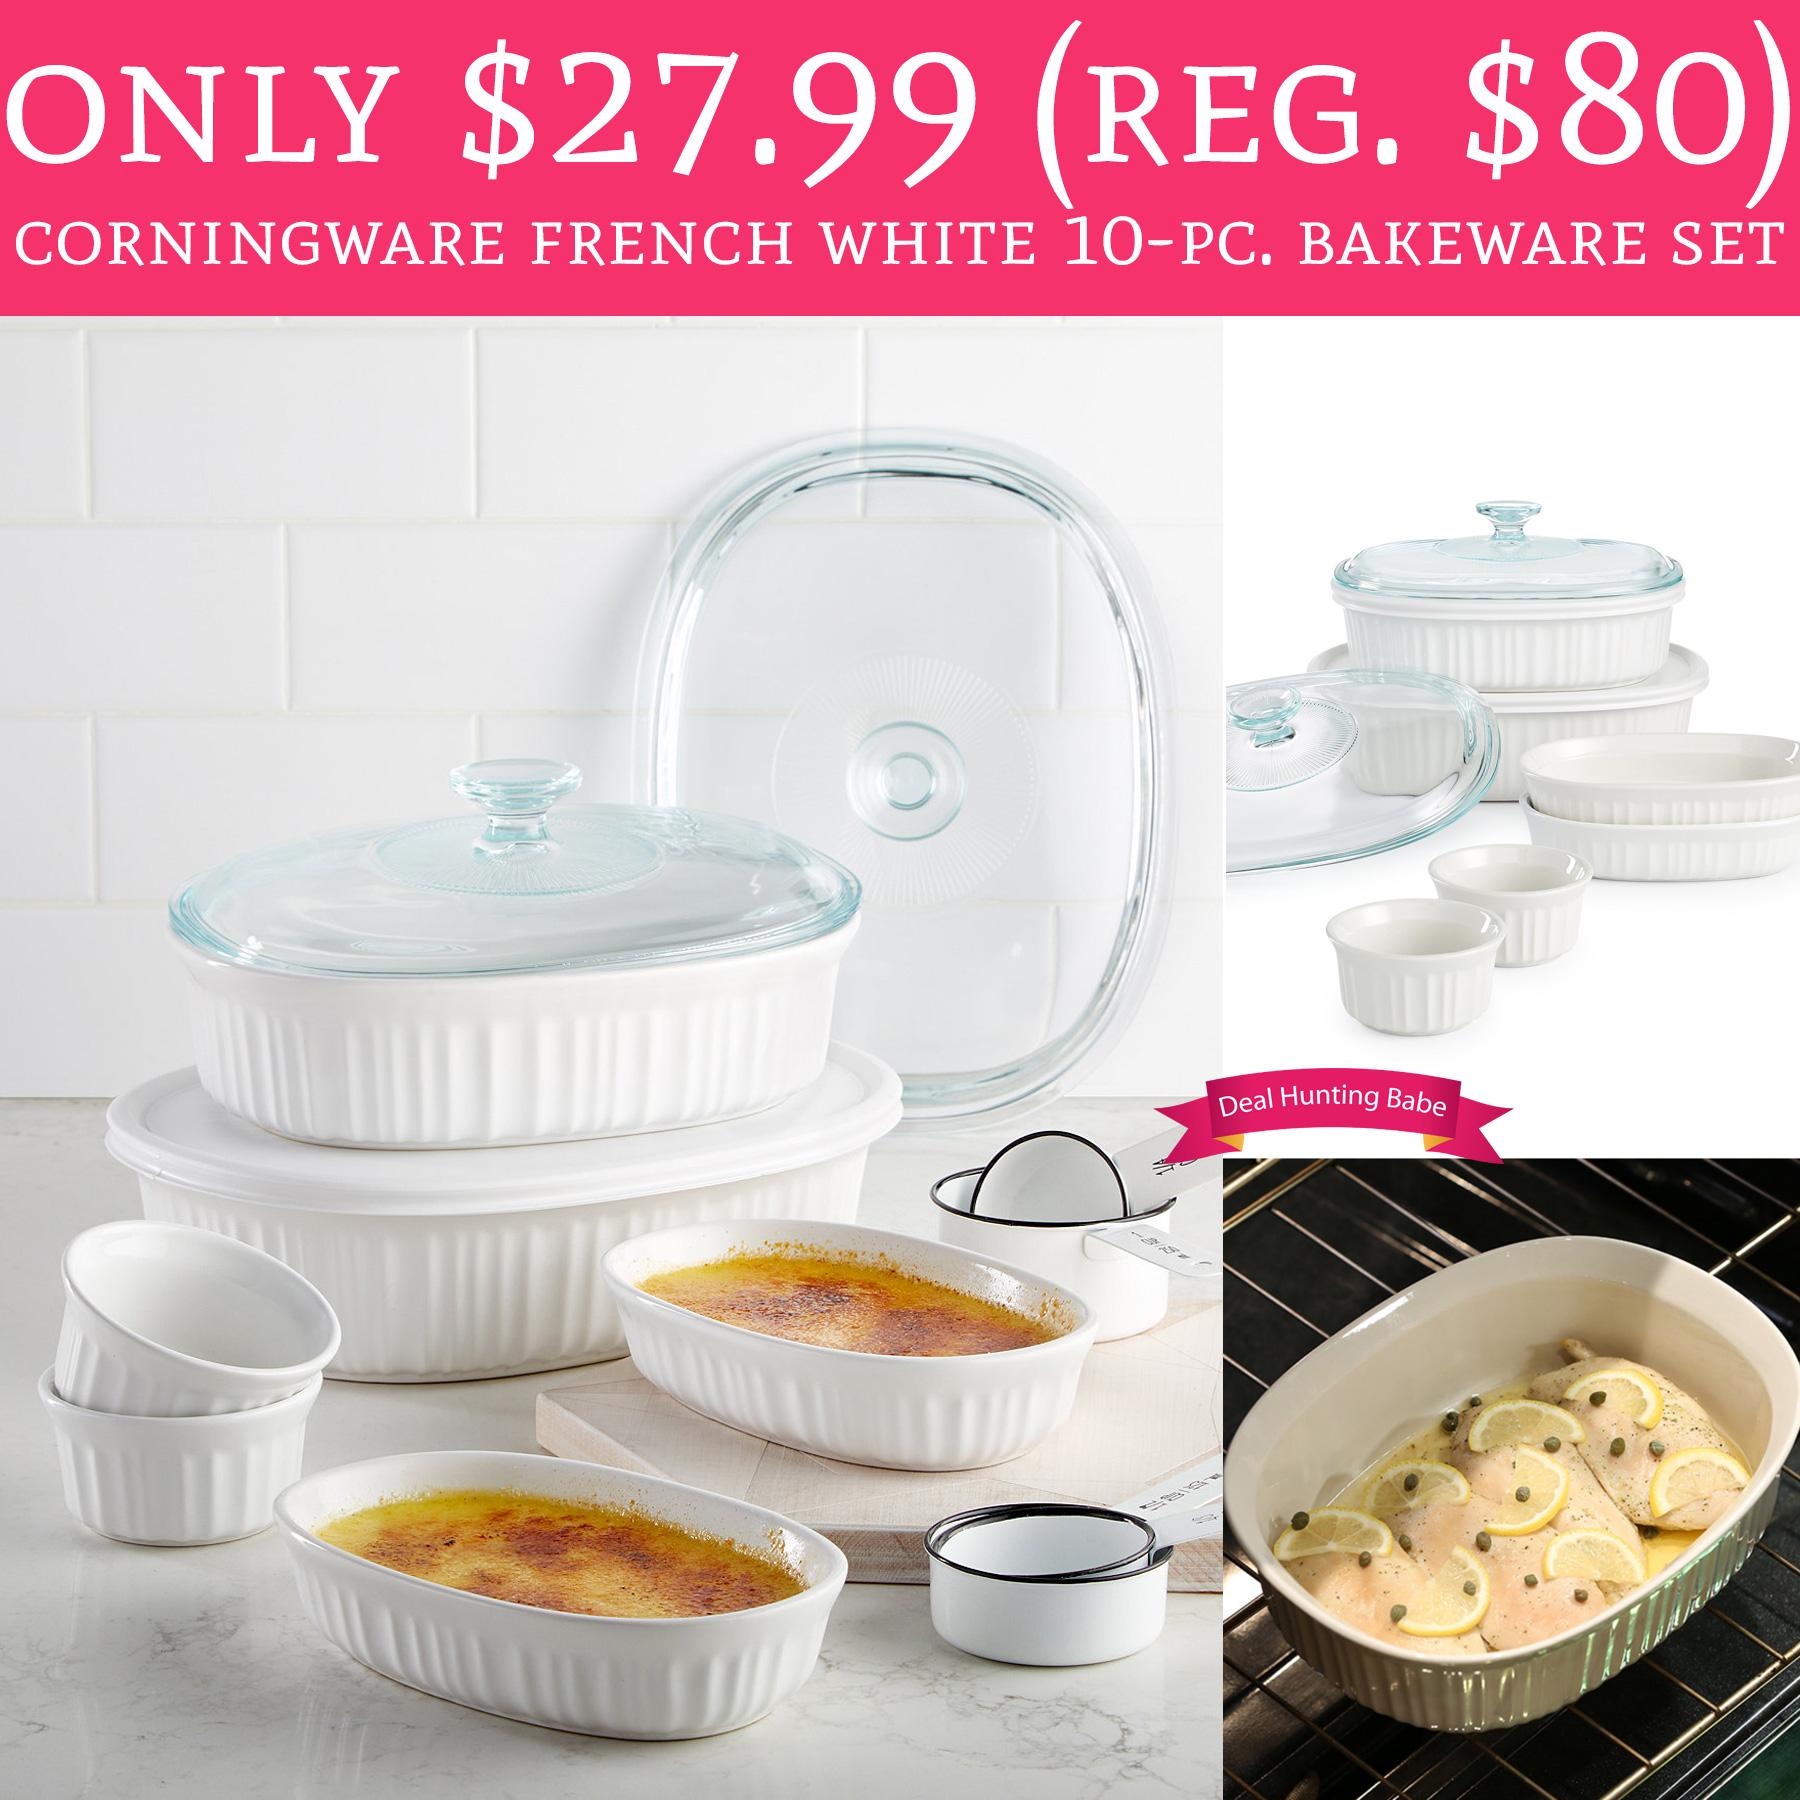 Coupon corningware - Target online coupon codes $5 off $50